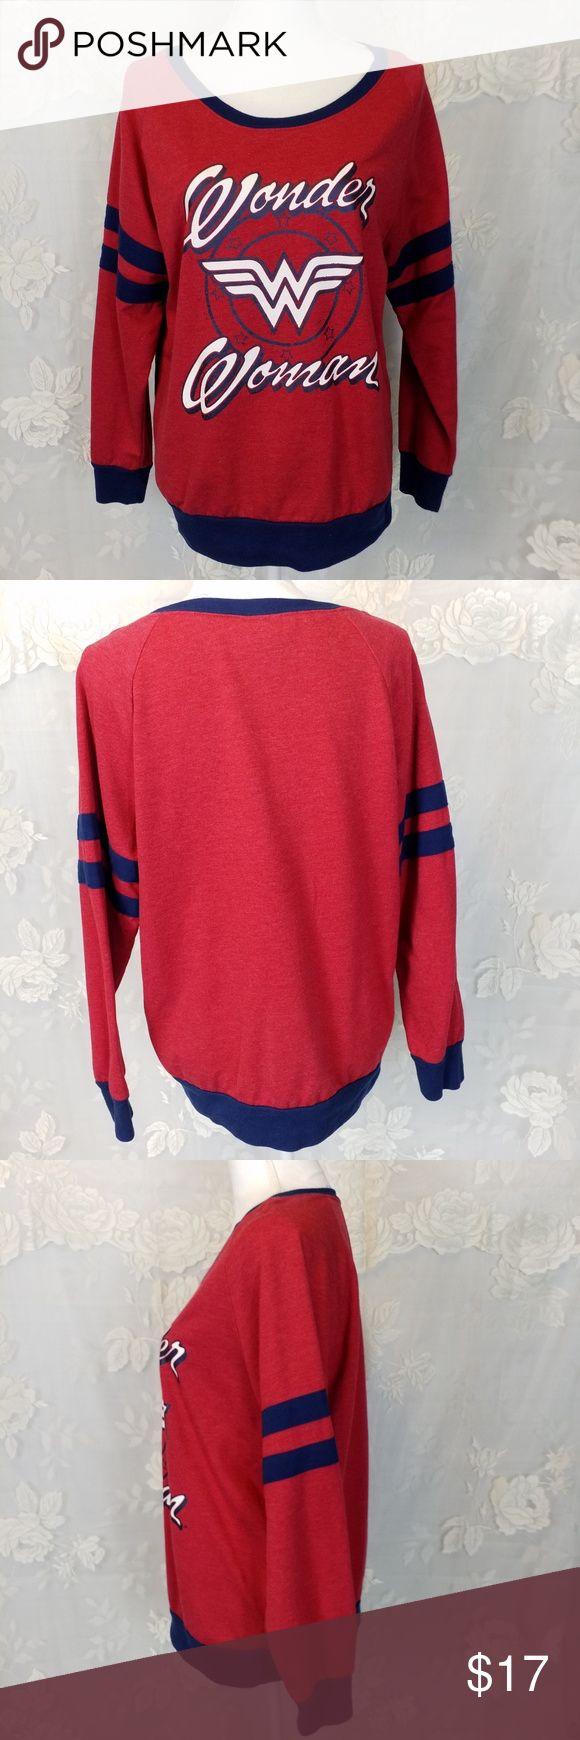 Wonder Woman sweatshirt red & navy size …